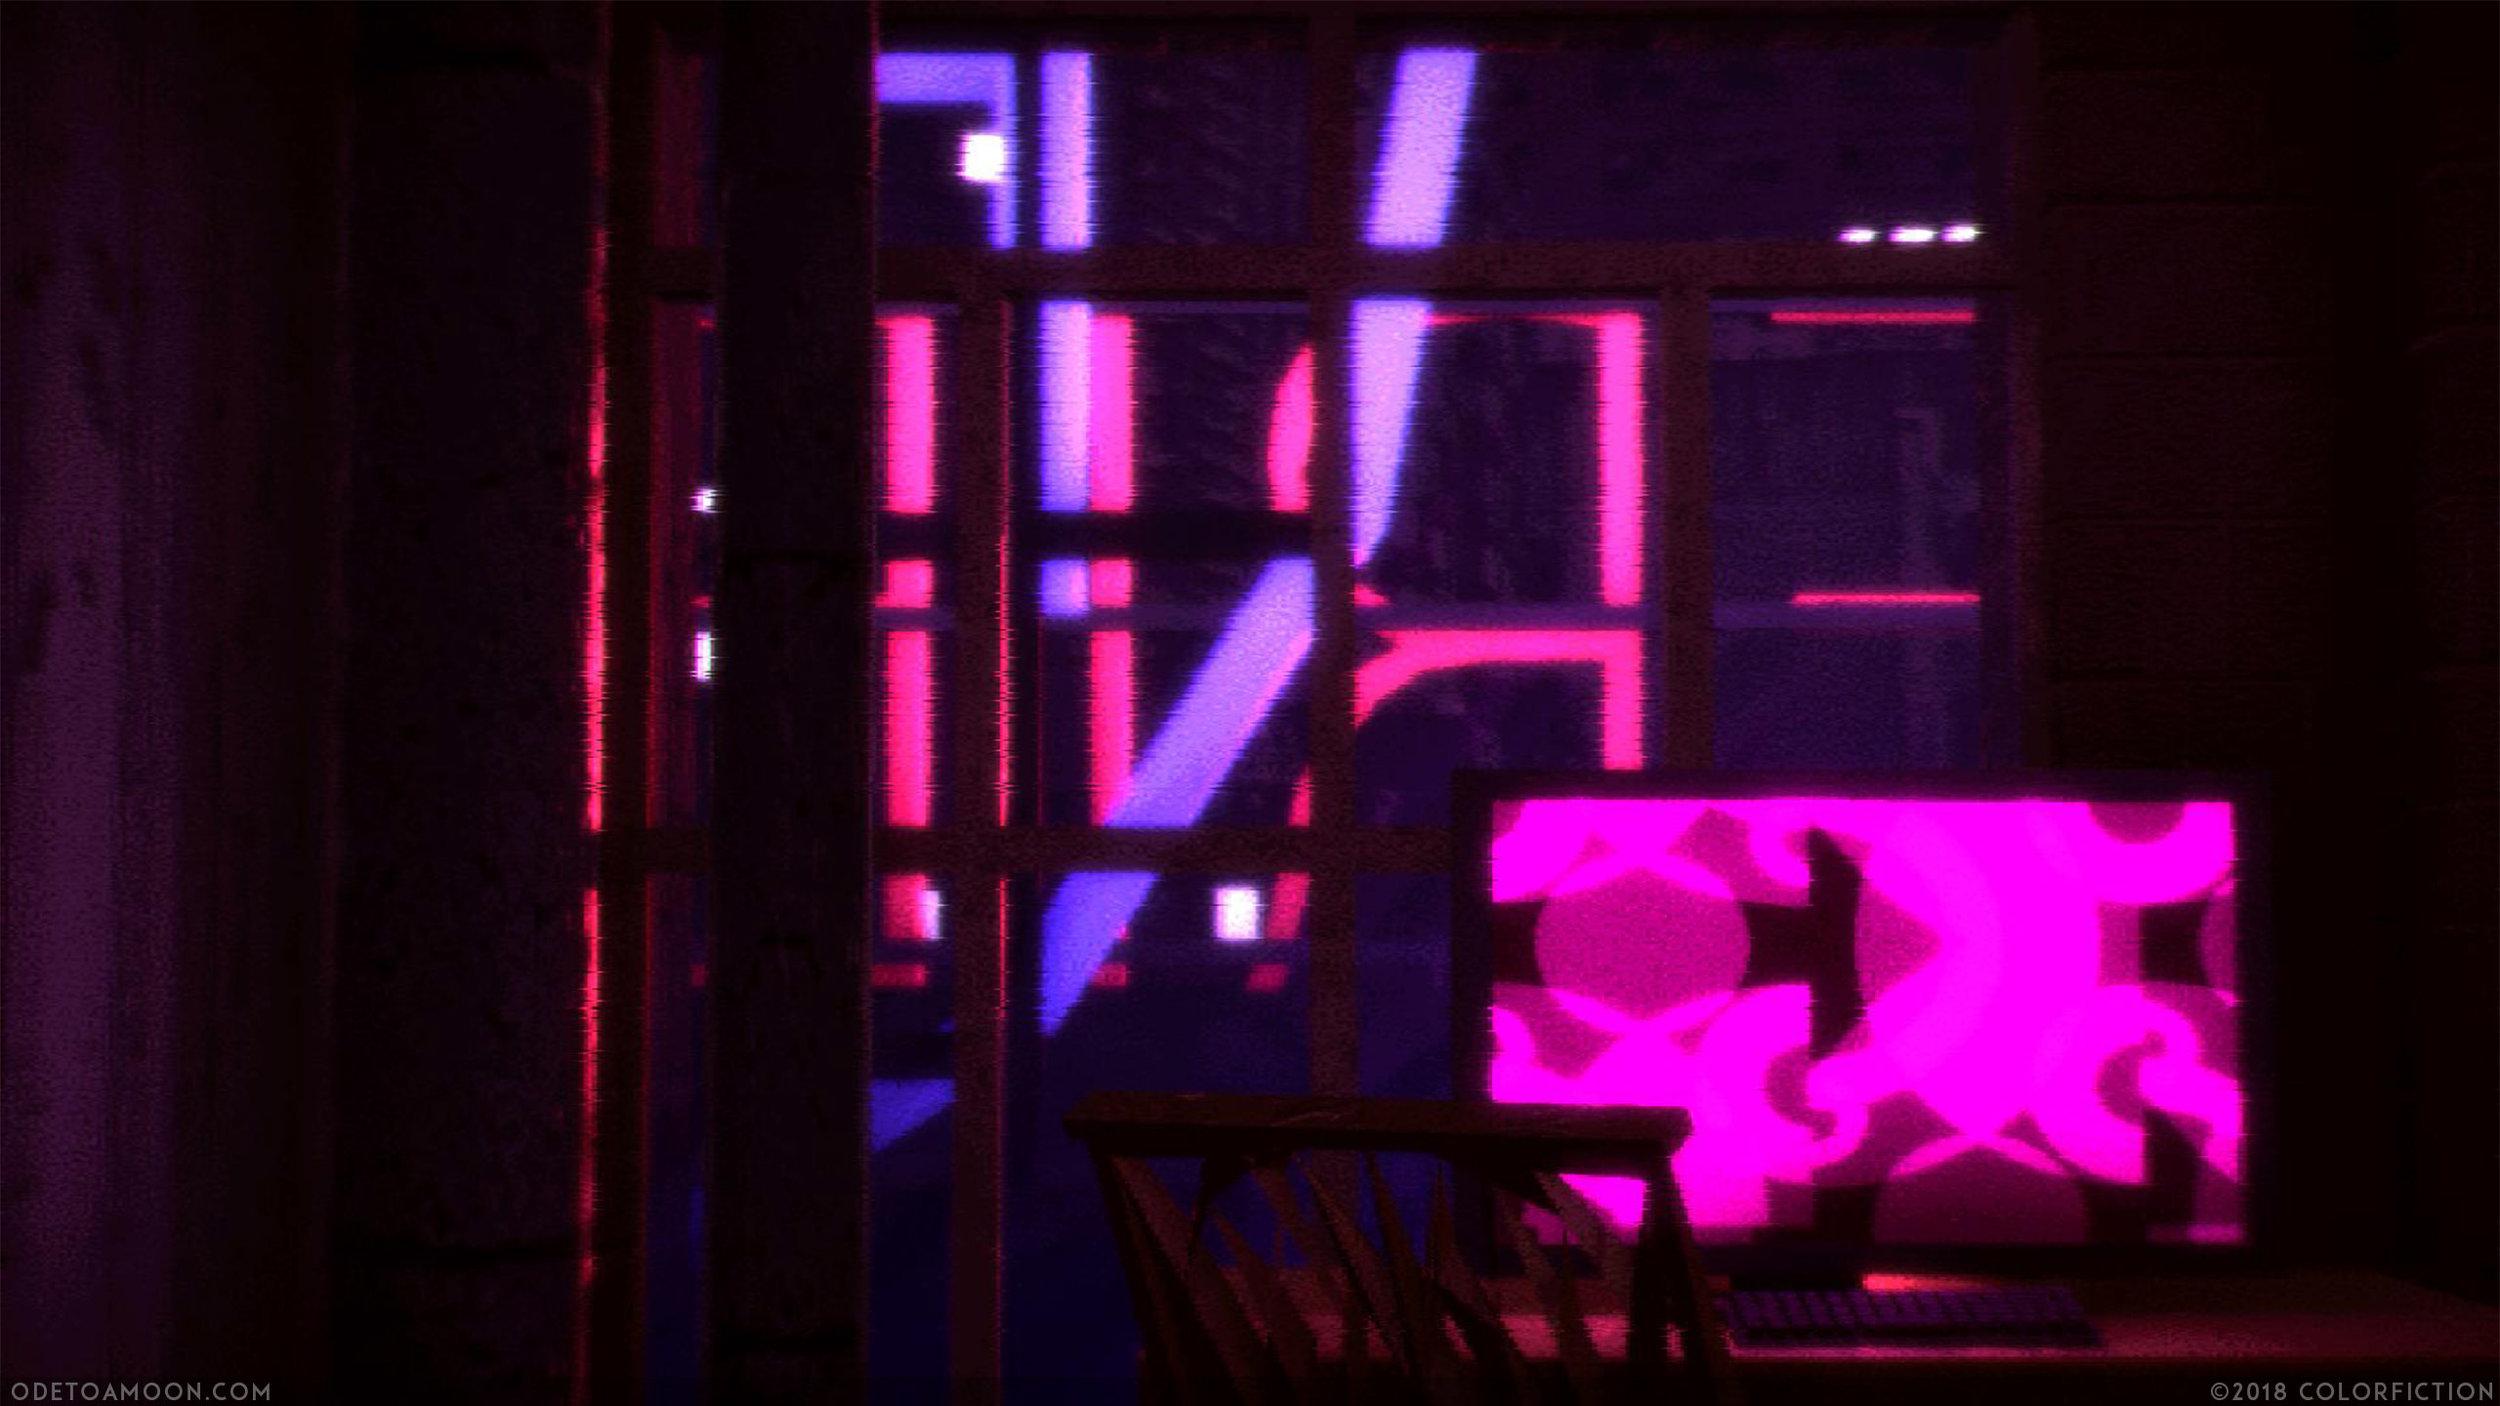 colorfiction_ode_to_a_moon_screenshot_10